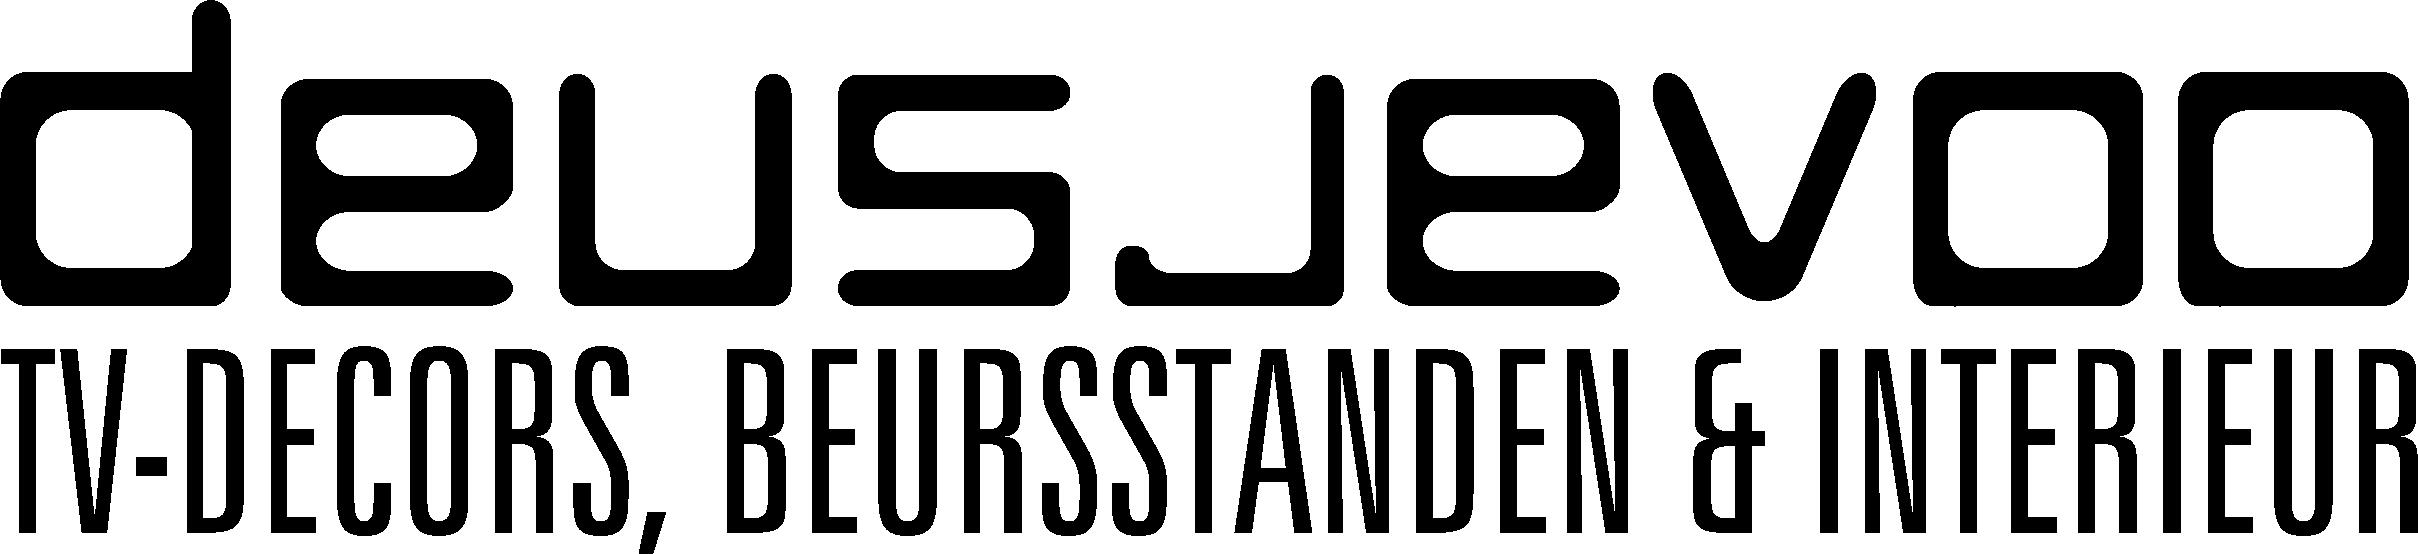 Logo klant van White Light: Deusjevoo